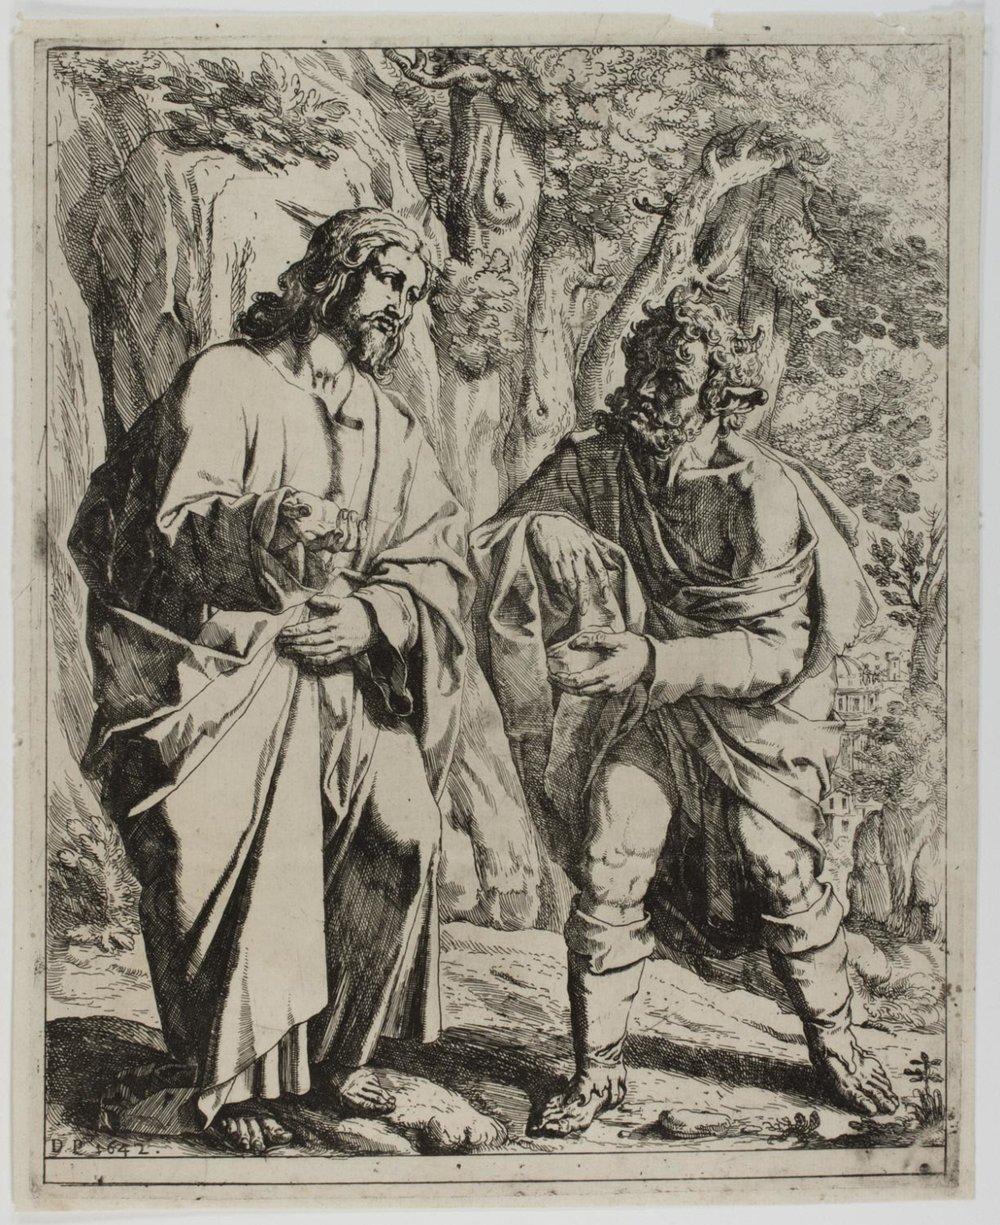 The Temptation of Christ  , 1642, by Domenico Peruzzini, Italian, from the  Philadelphia Museum of Art